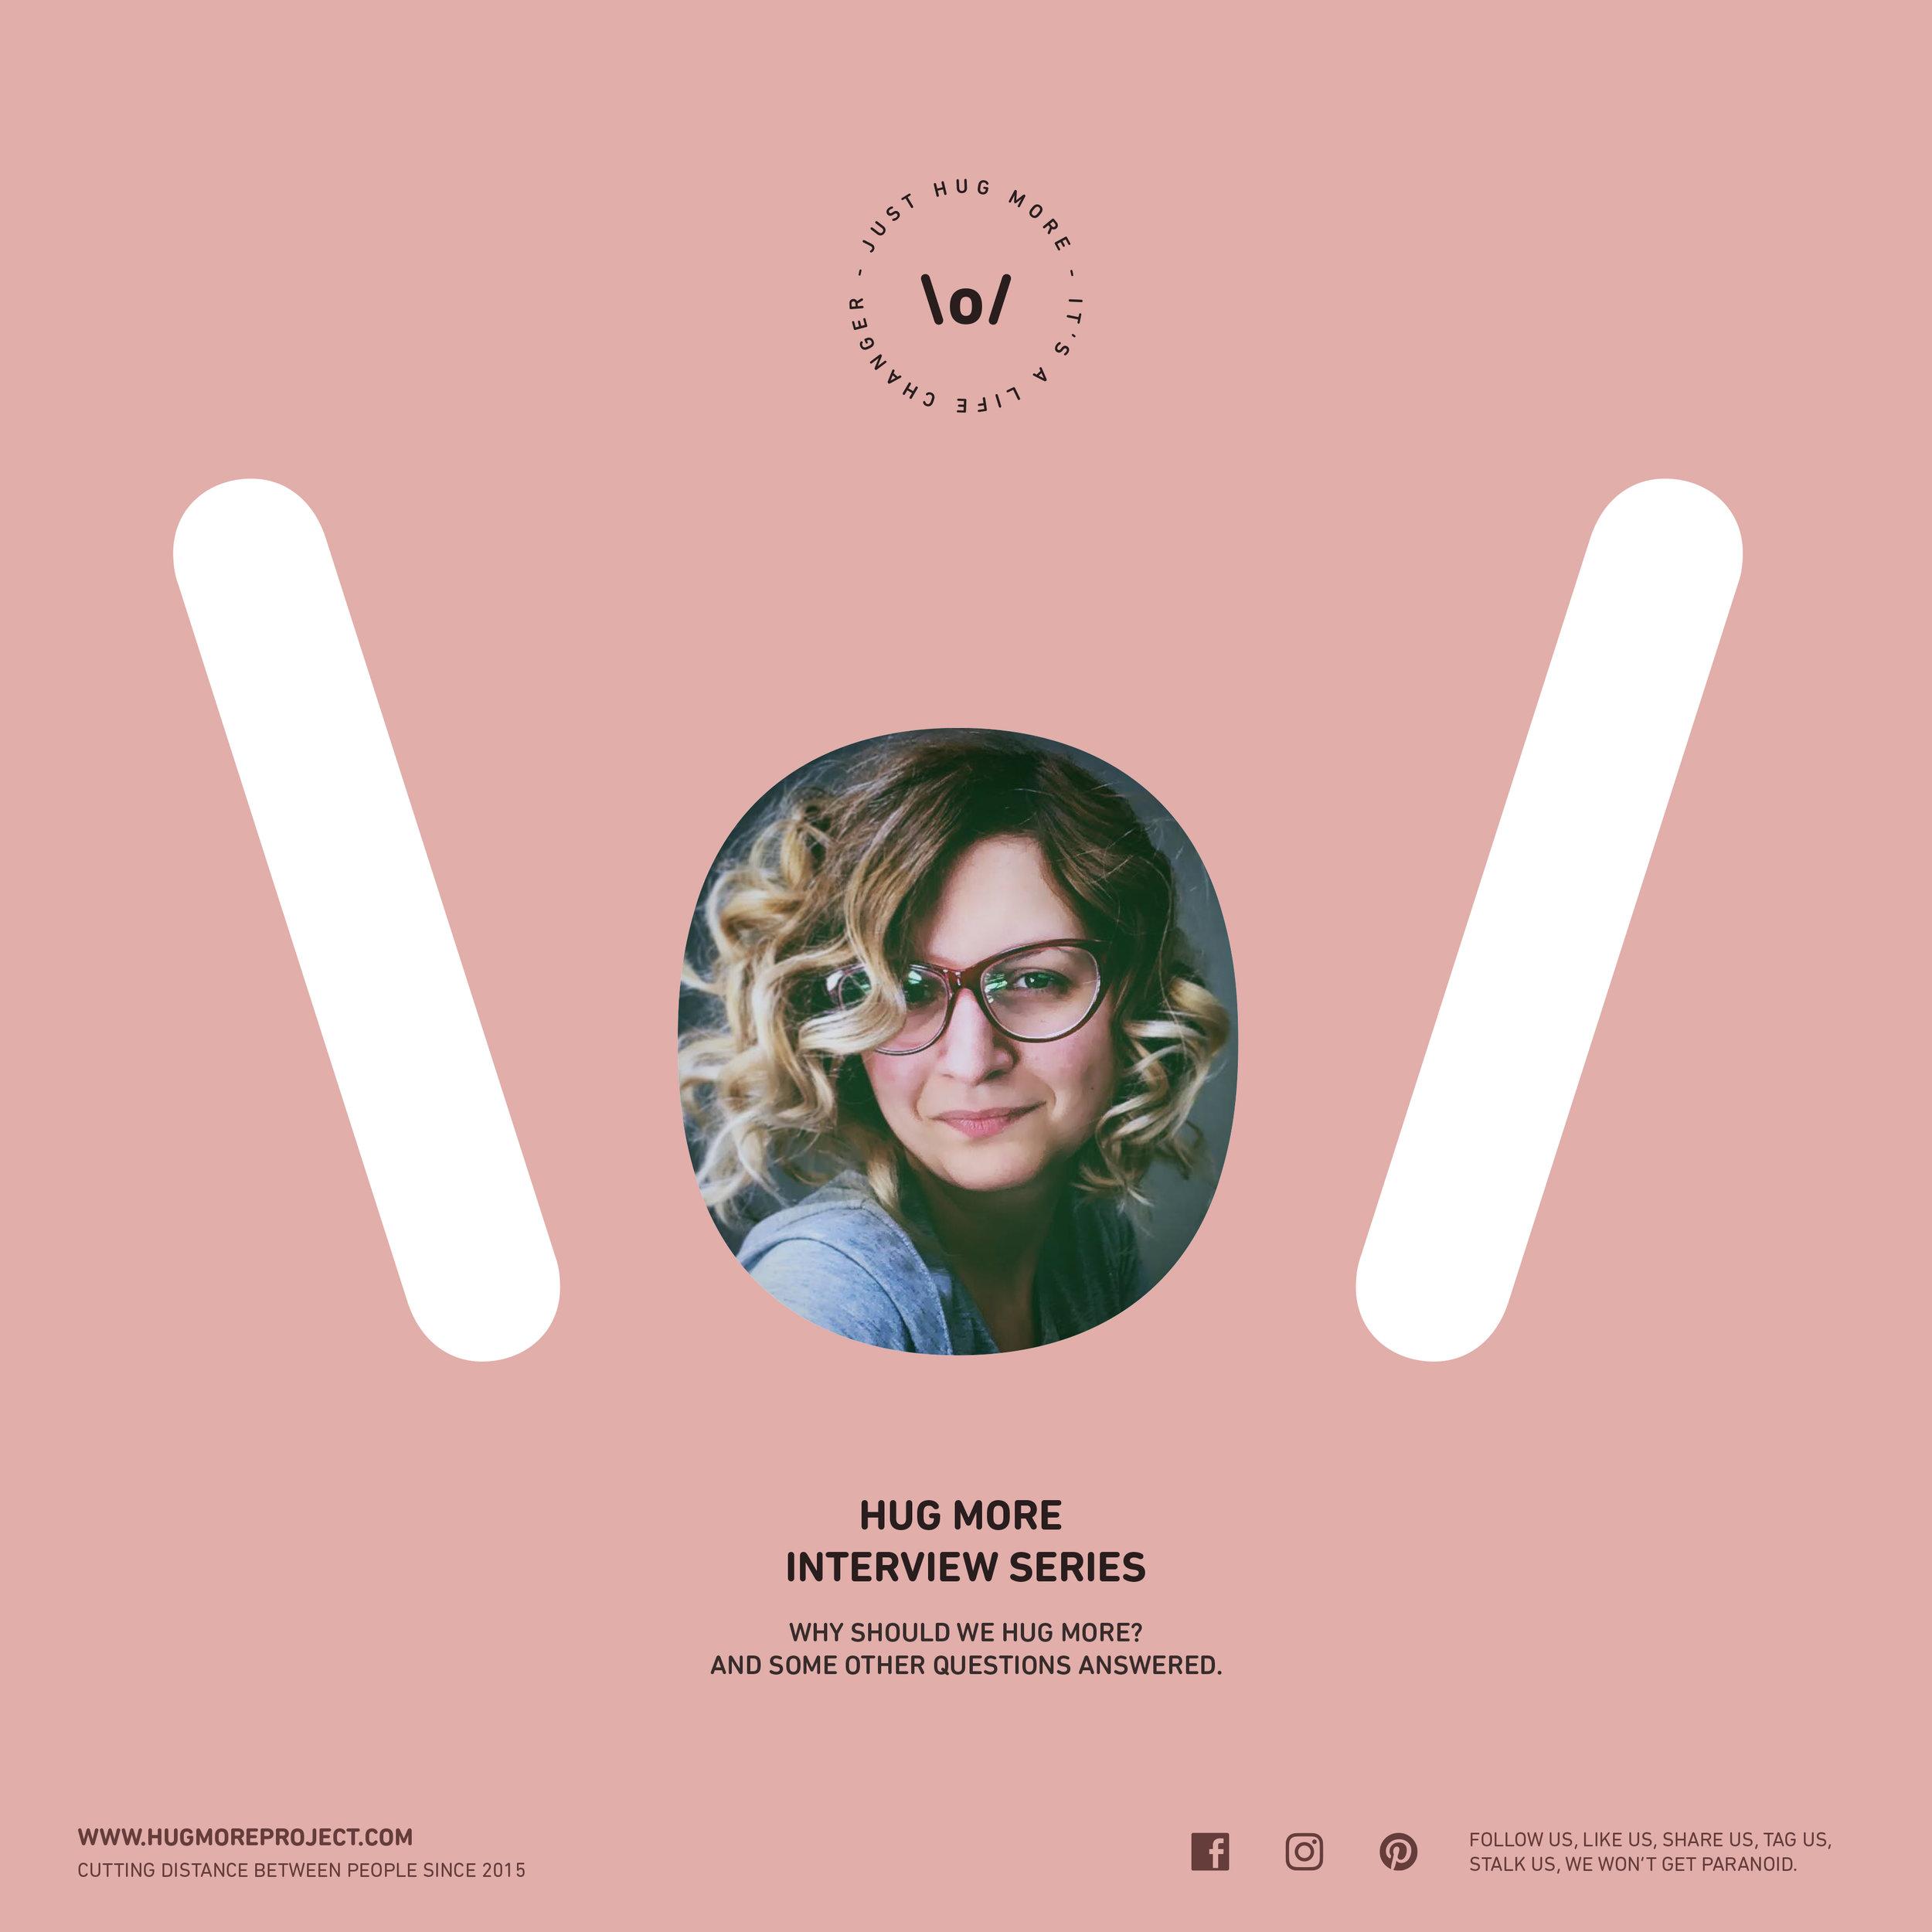 HUG-MORE-interview-017-Branka-Milojevic.jpg